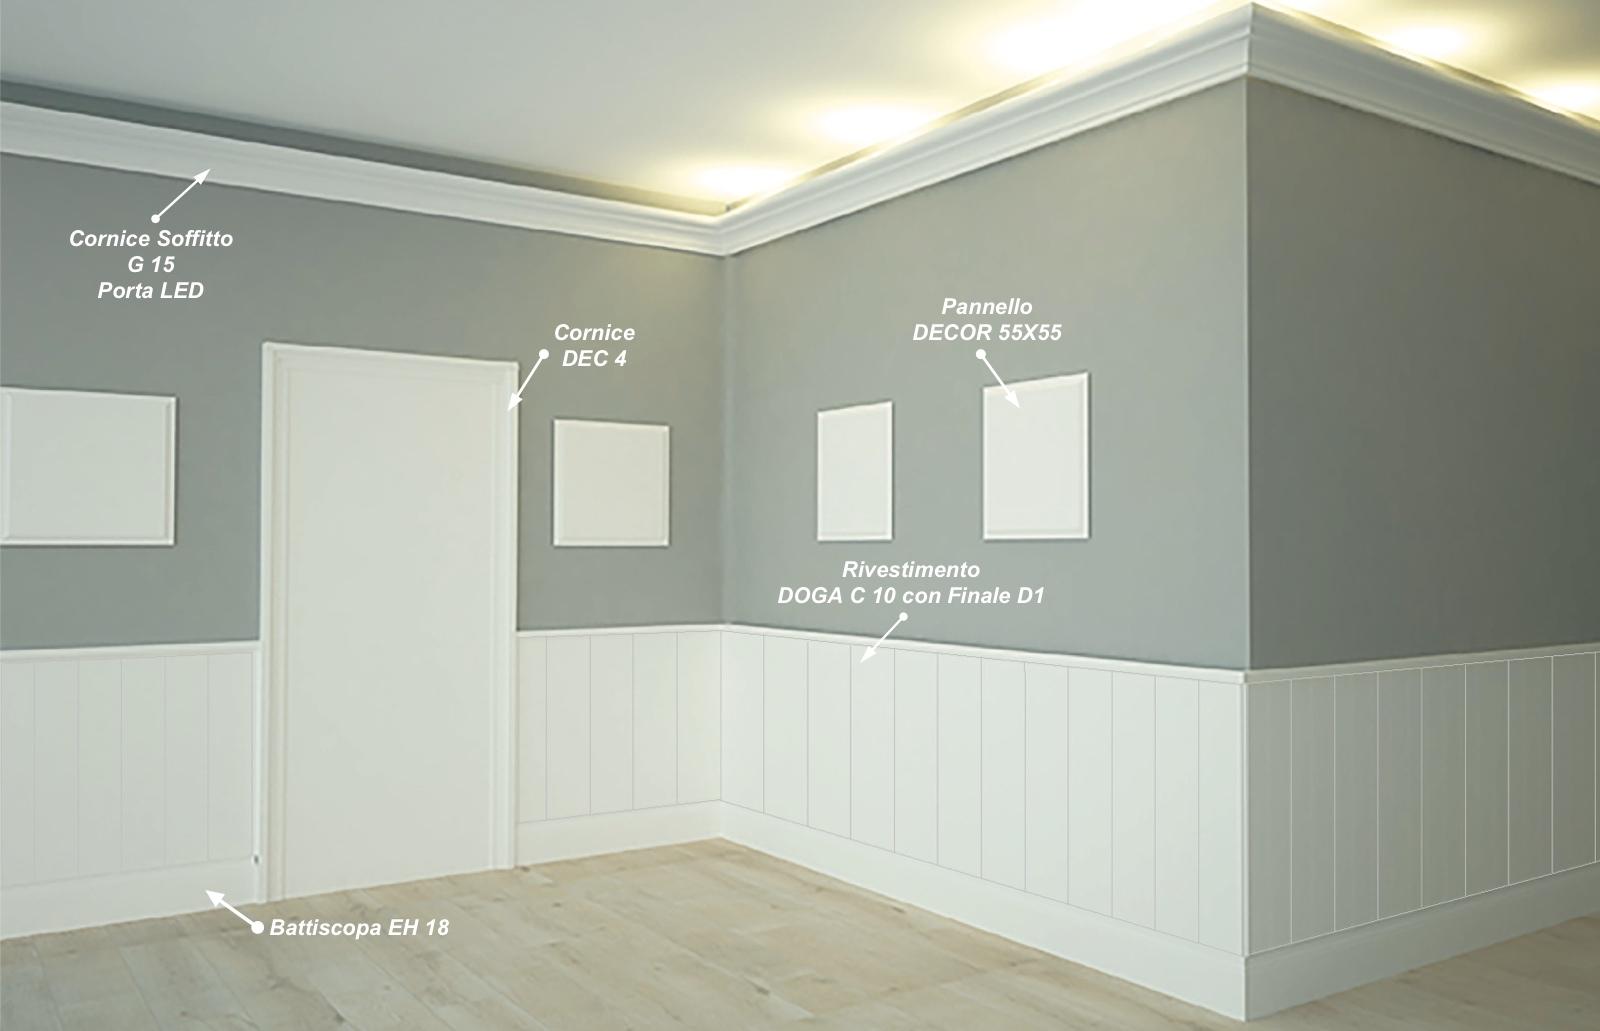 Battiscopa EH 18 - Battiscopa in MDF Light bianco - Decorget - Ital Decori - Image 2